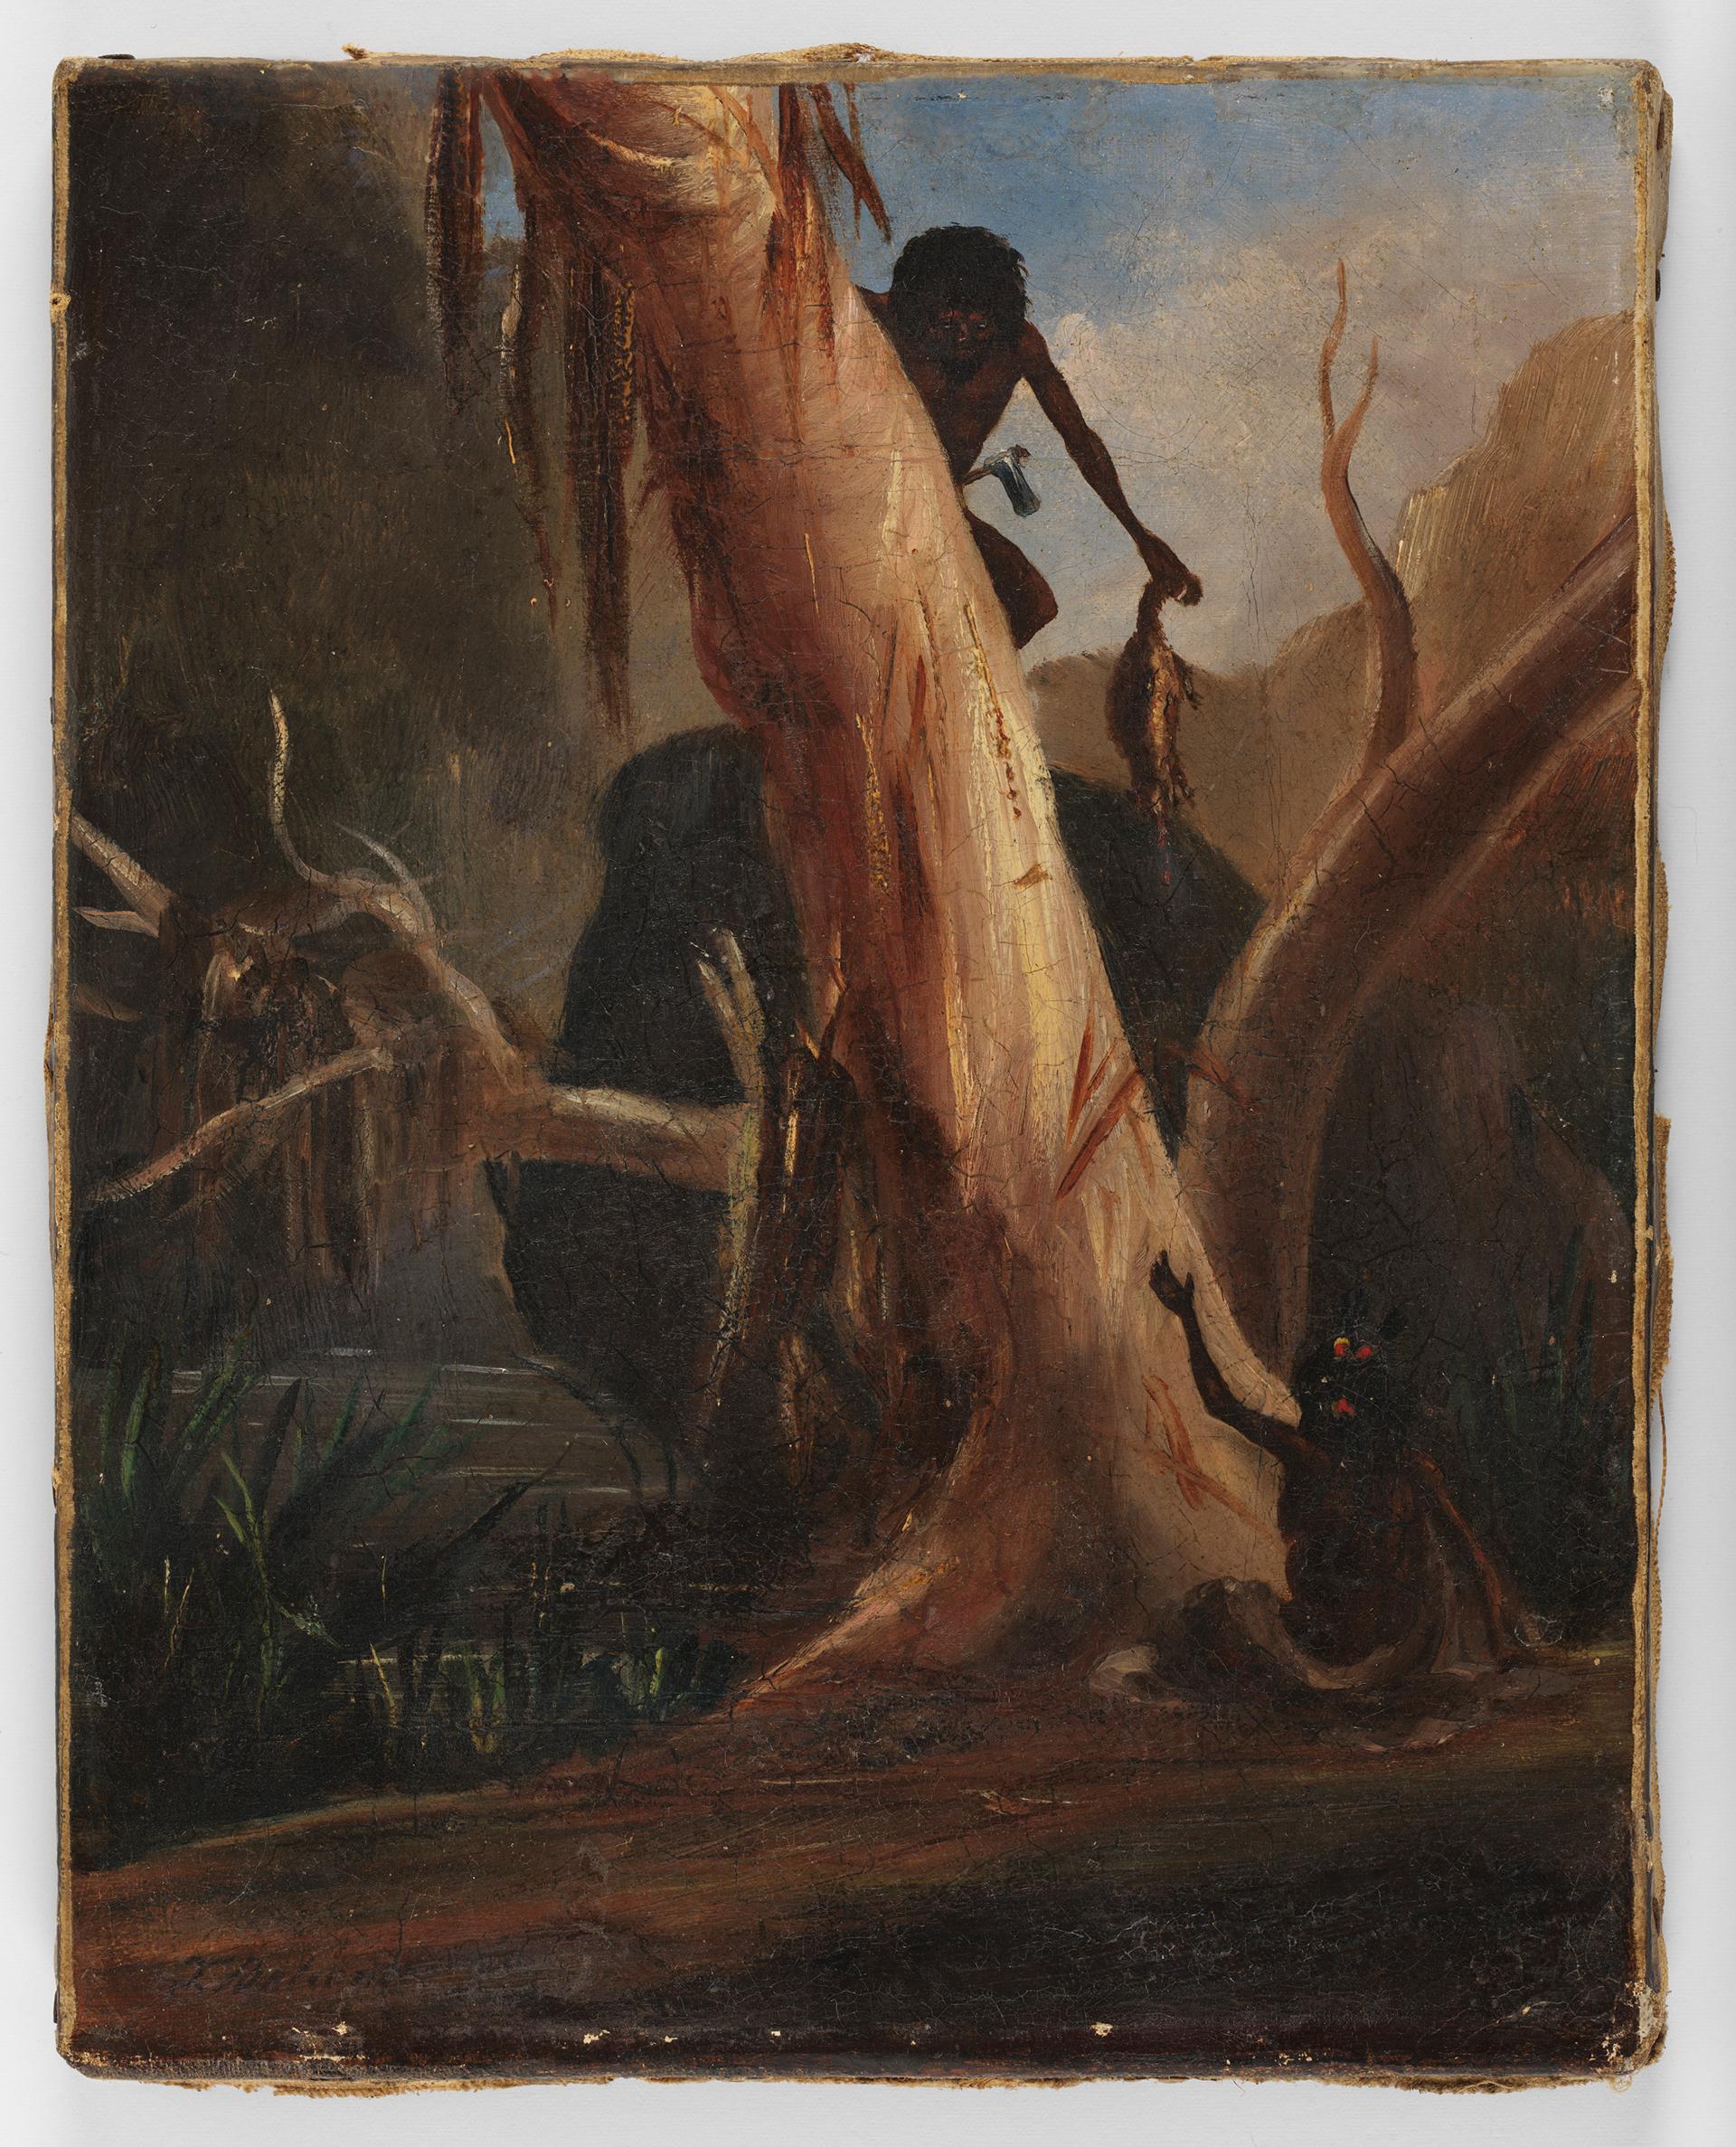 [Aborigines hunting], April 1858 / T. Balcombe